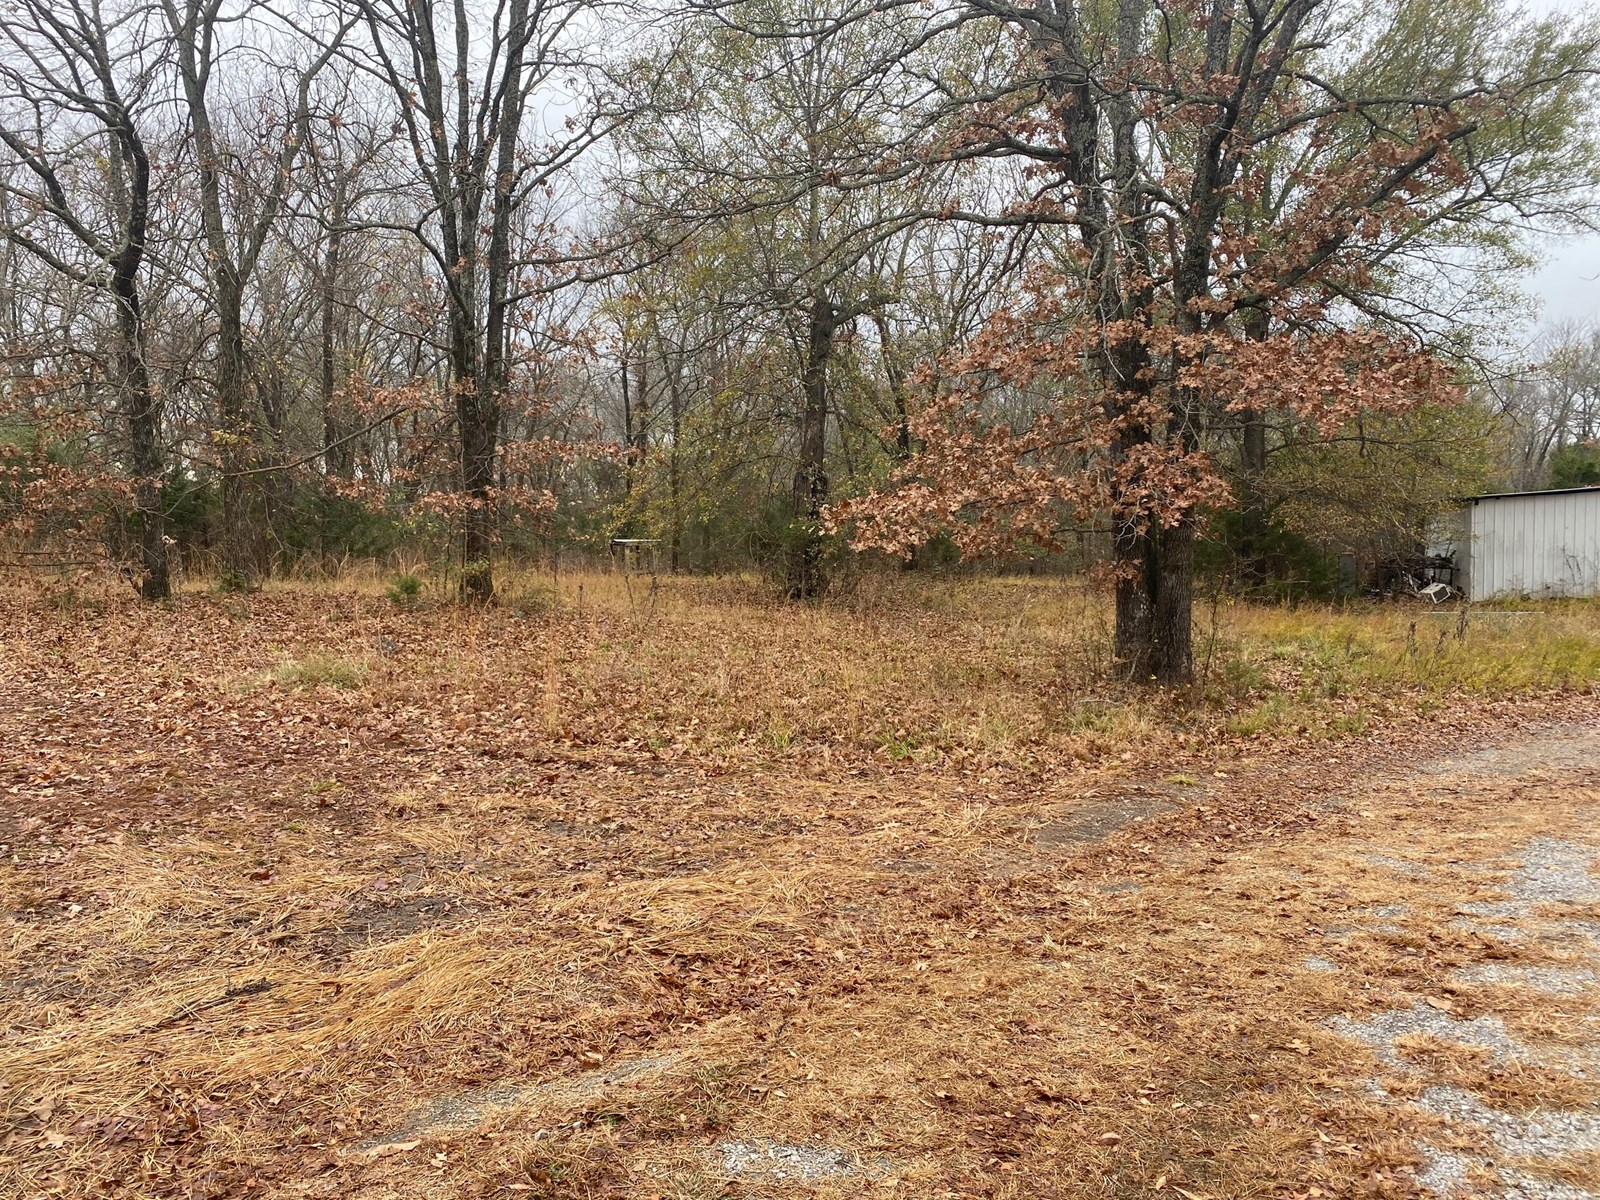 Land for Sale Lake Sardis Clayton,OK-Pushmataha County Land